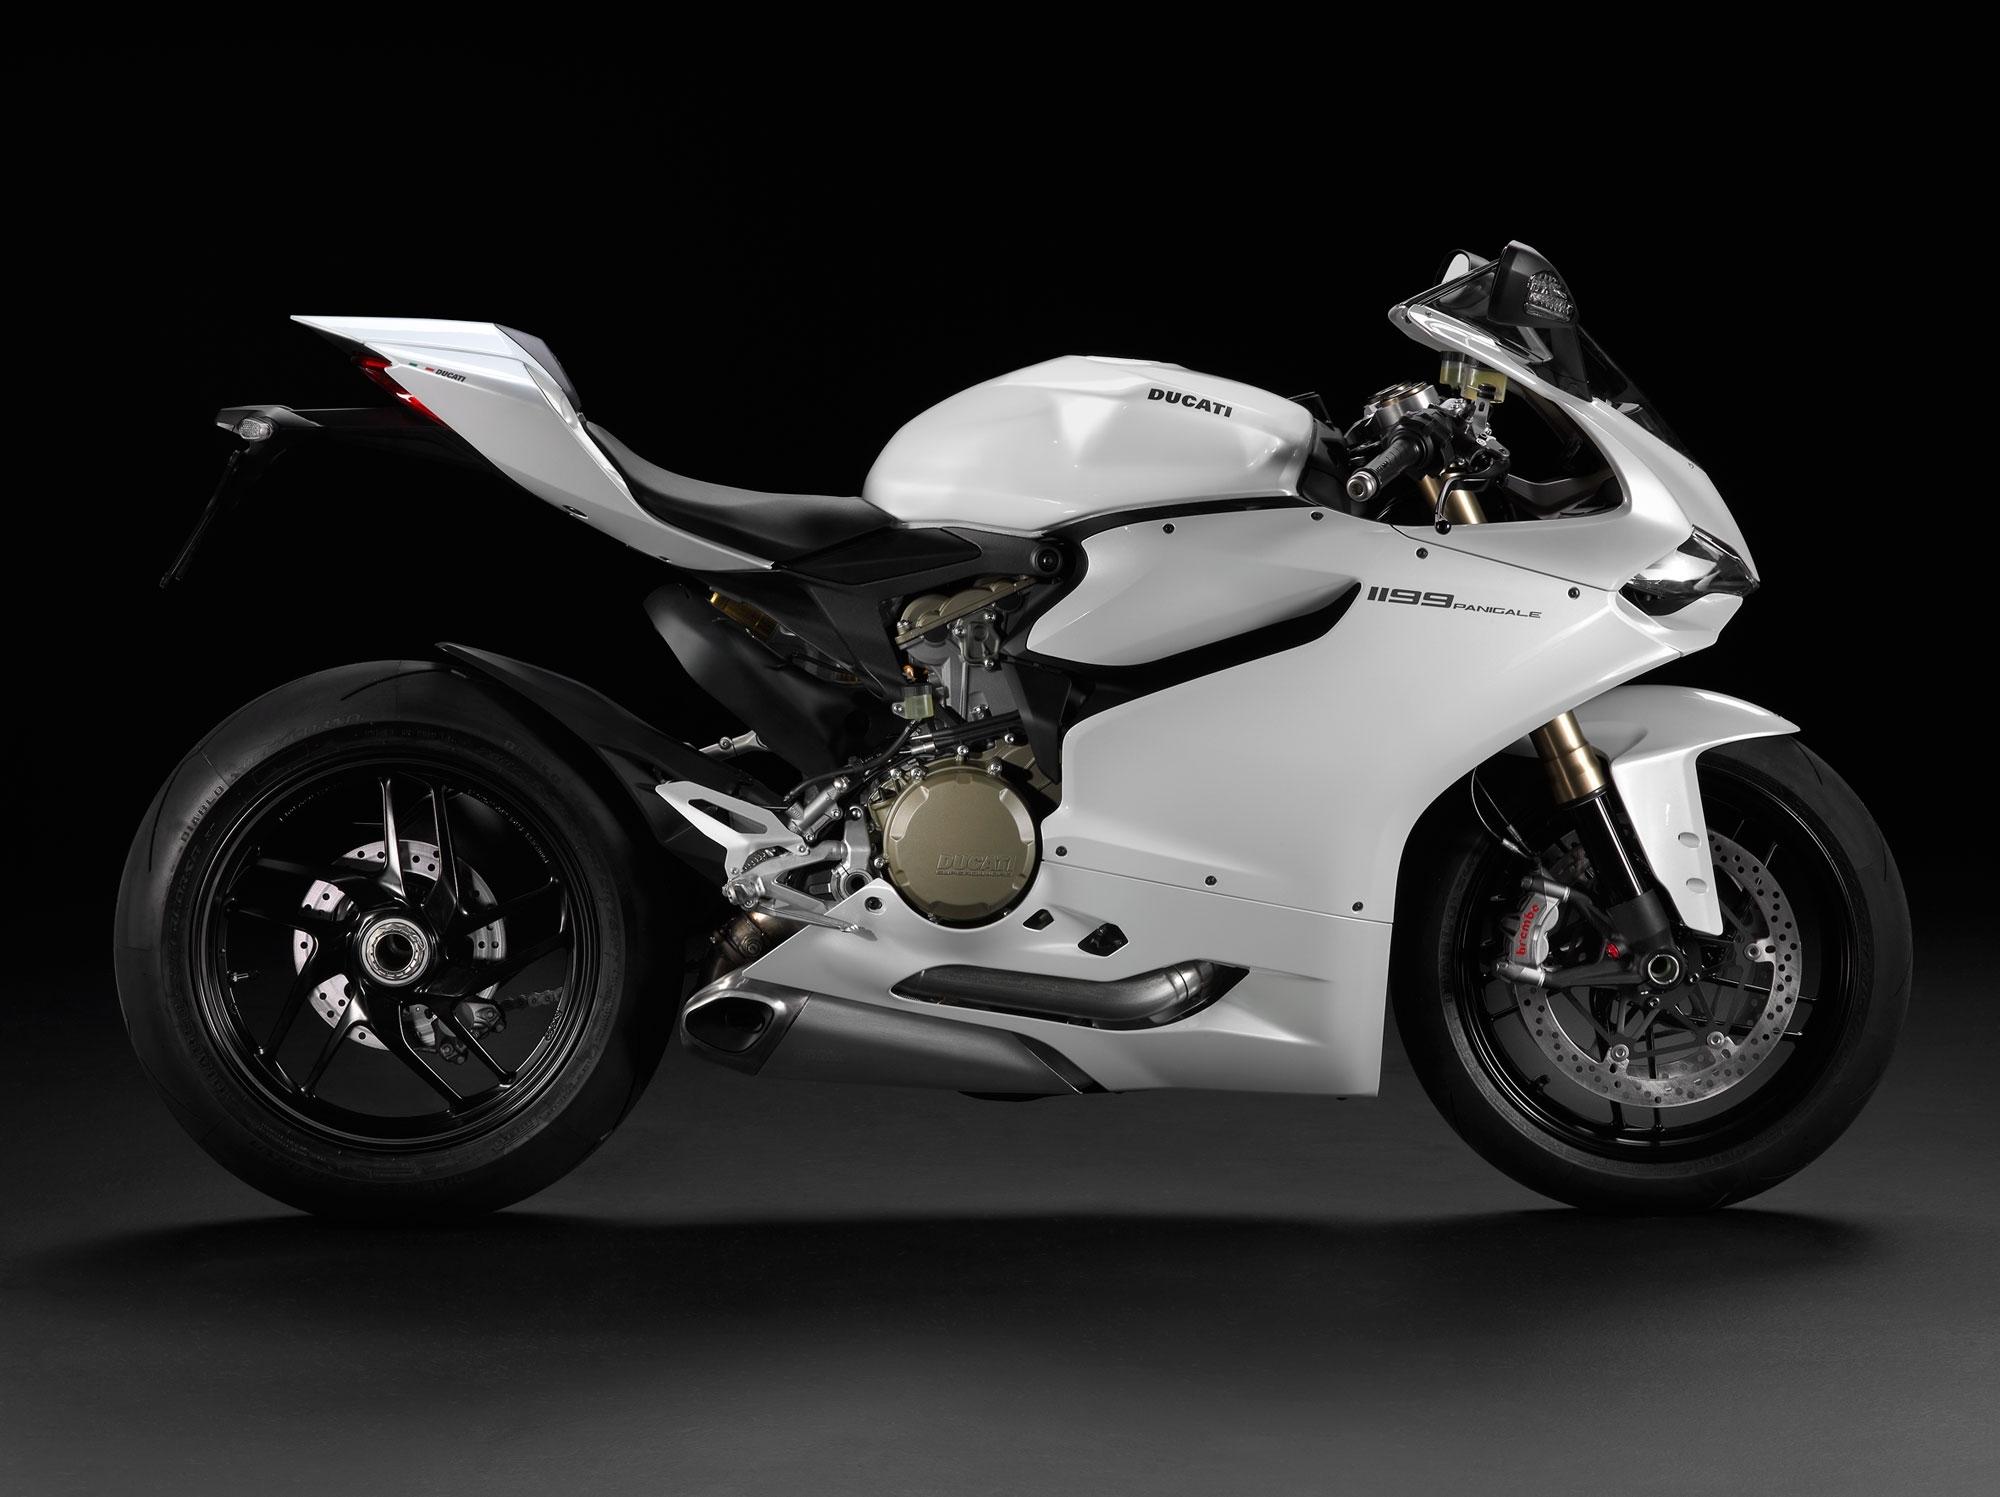 ducati superbike images